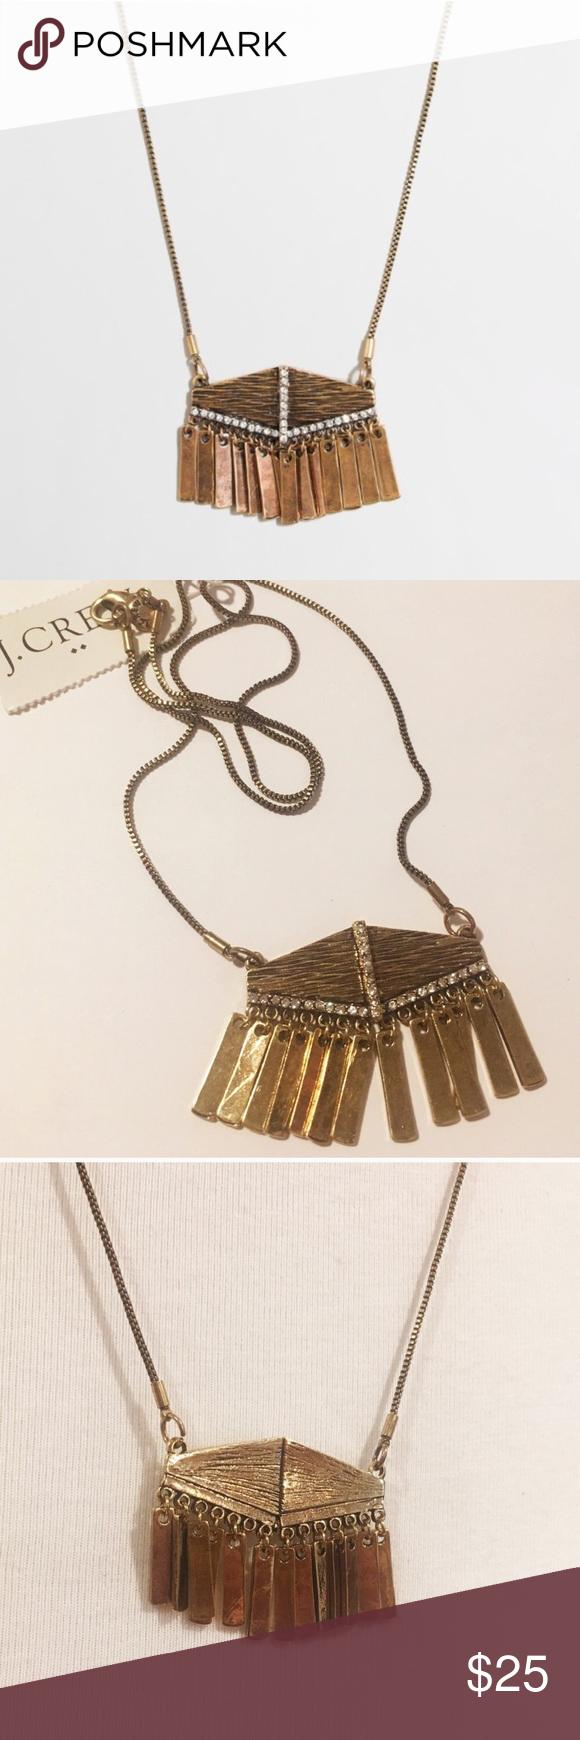 j crew fringe crystal pendant necklace nwt crystal pendant